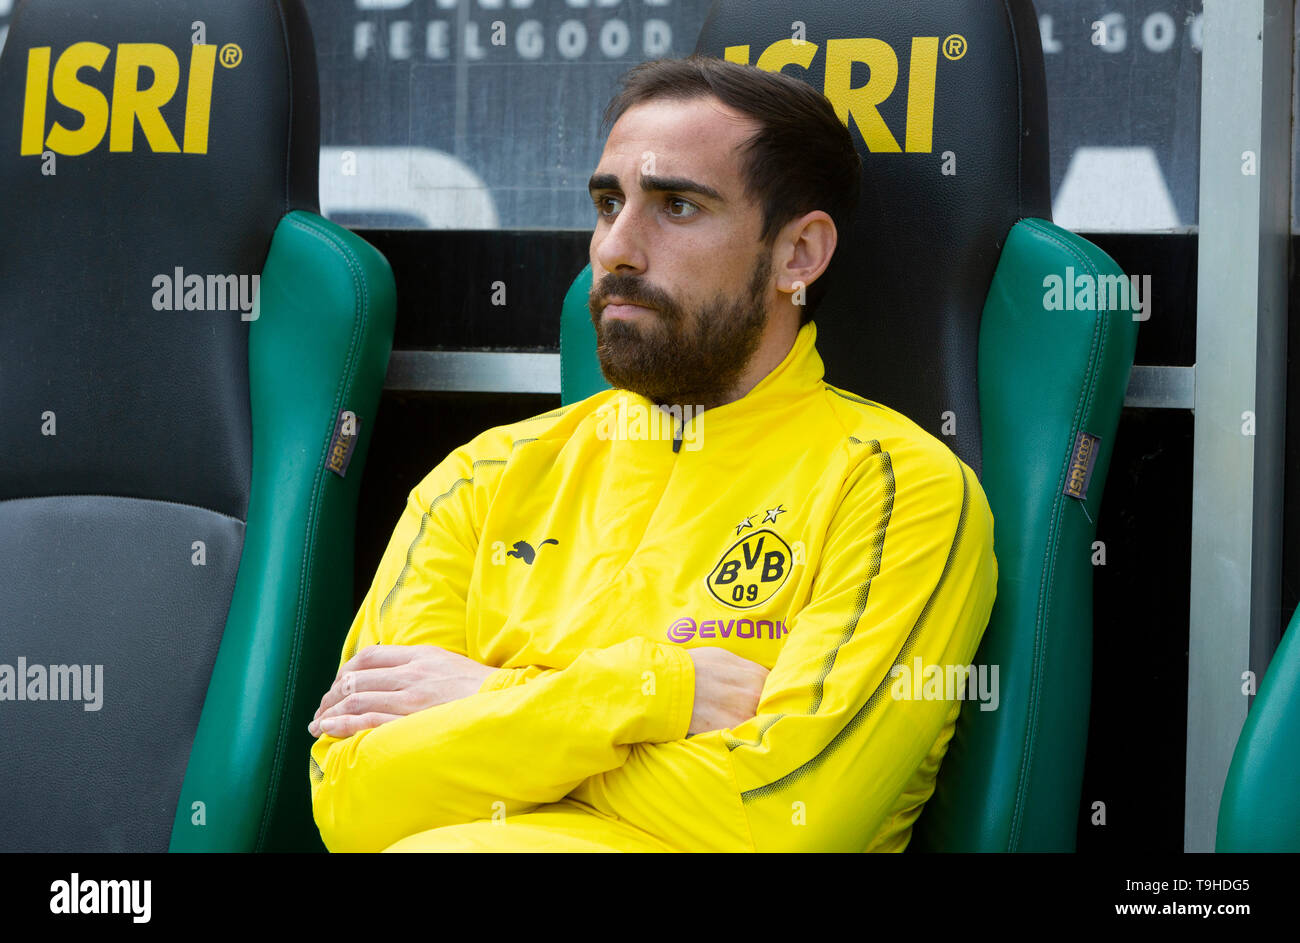 sports, football, Bundesliga, 2018/2019, Borussia Moenchengladbach vs. BVB Borussia Dortmund 0-2, Stadium Borussia Park, players bench, Paco Alcacer (BVB), DFL REGULATIONS PROHIBIT ANY USE OF PHOTOGRAPHS AS IMAGE SEQUENCES AND/OR QUASI-VIDEO - Stock Image